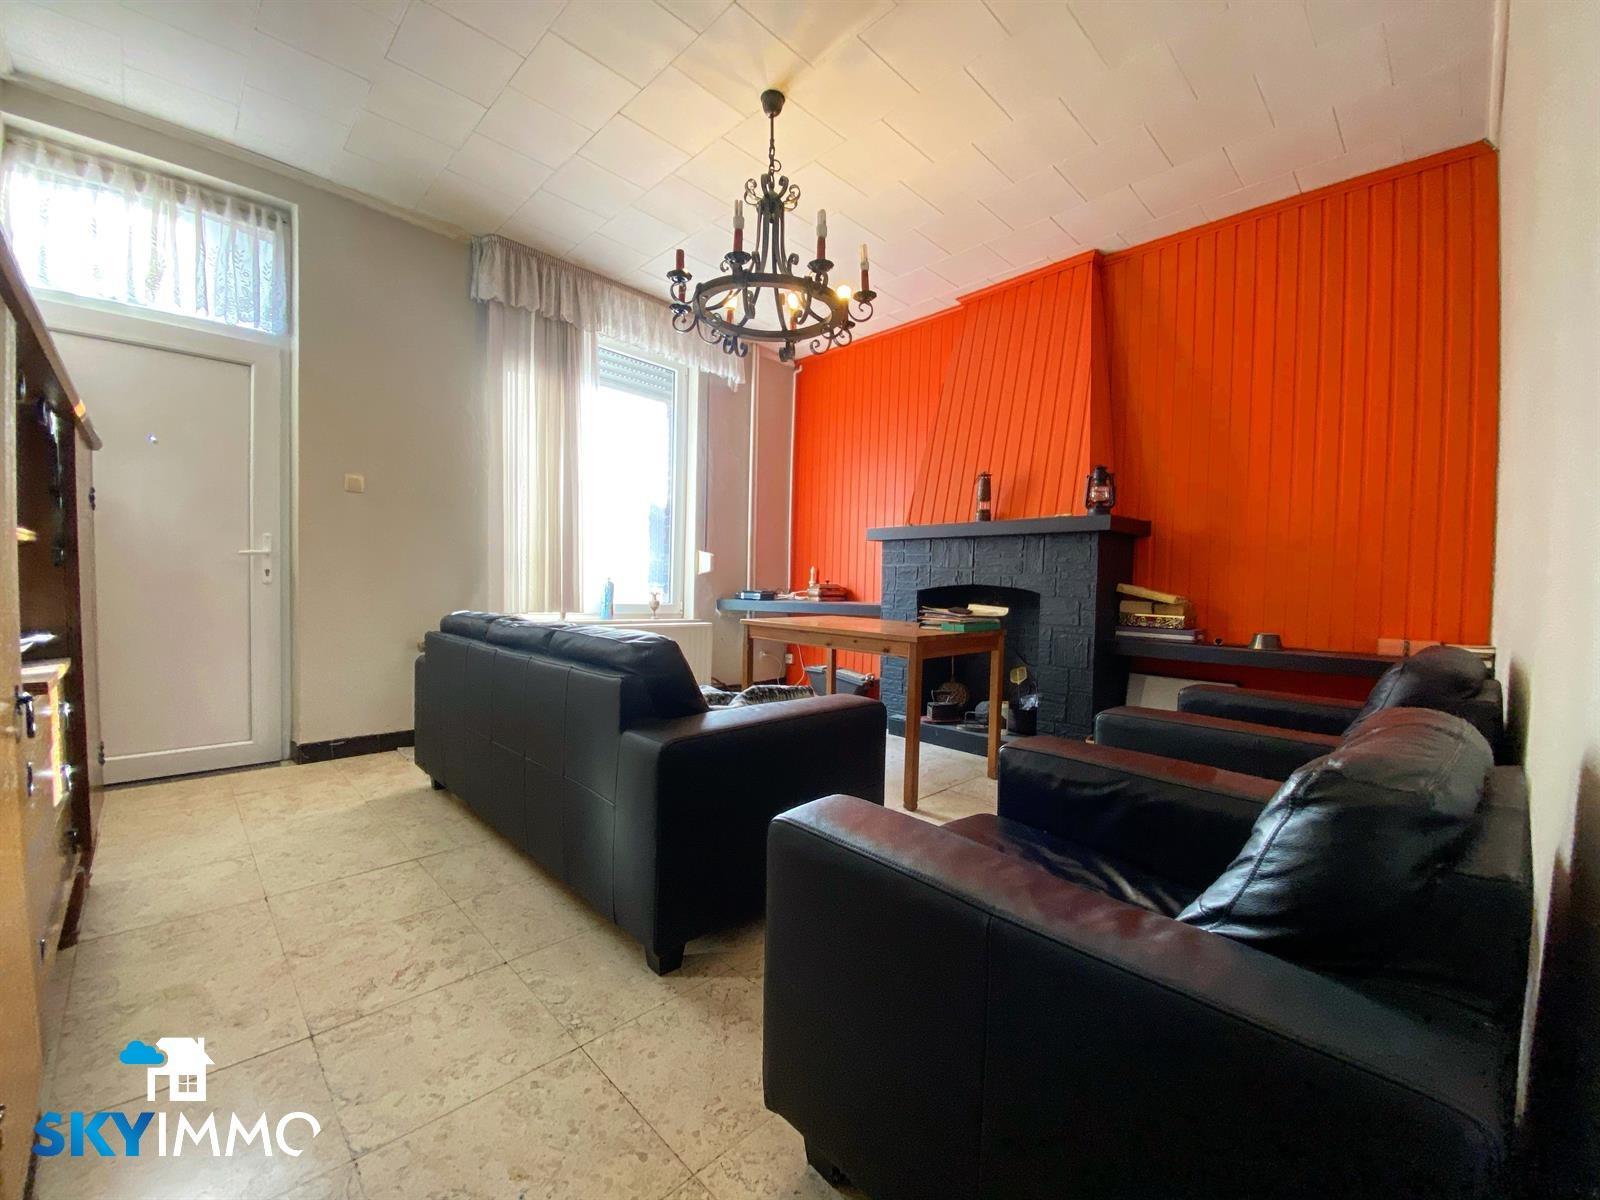 Maison - Saint-Nicolas - #4287983-3